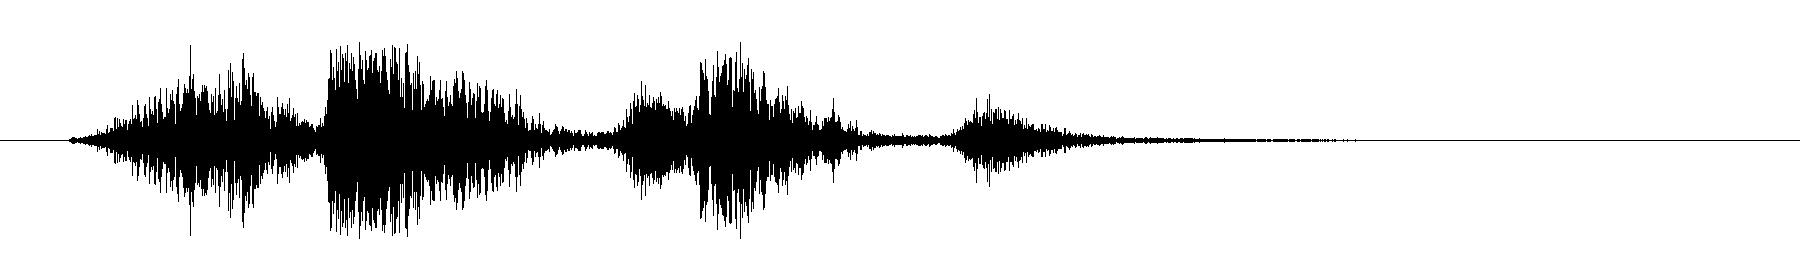 vocoder 1   circuit